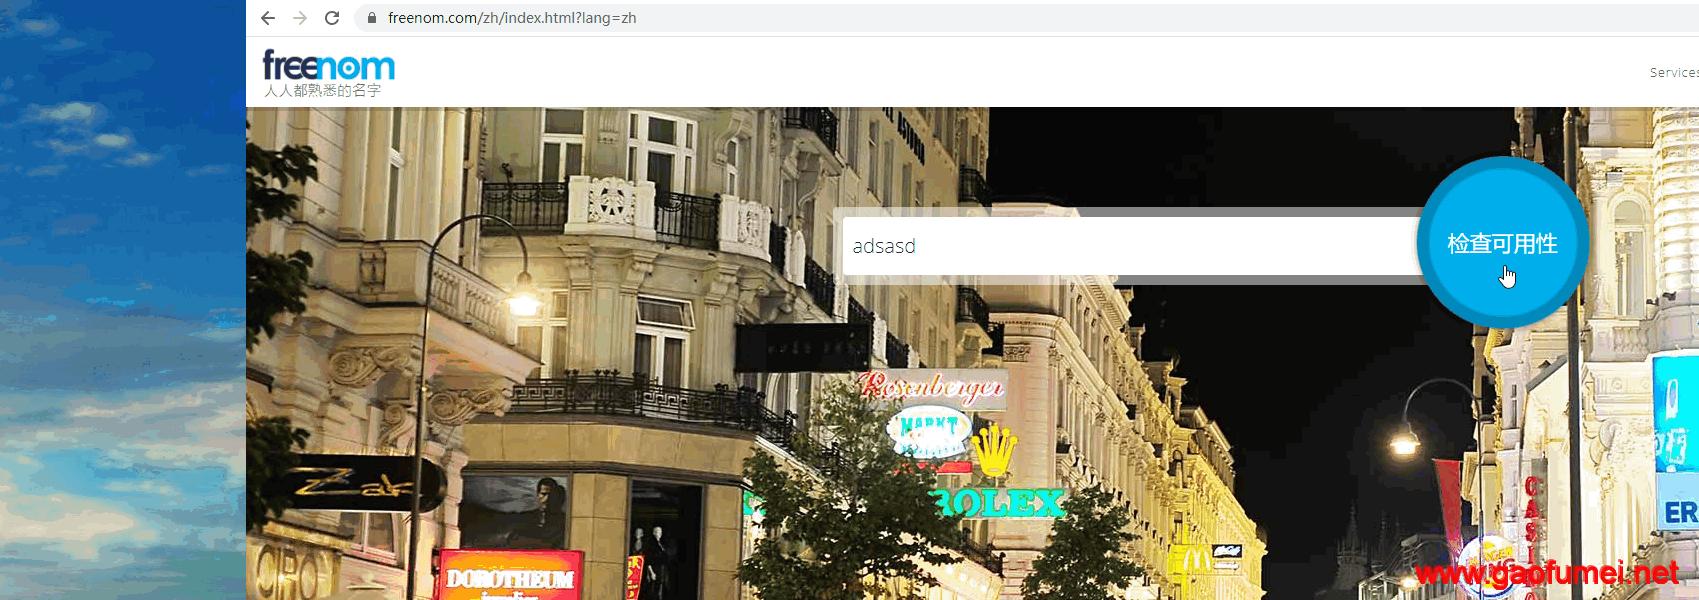 freenom用谷歌帐号来登陆,直接提示:Your social login could not be deturemined无法确定您的社交登录名.)的终级解决办法,亲测有效。 网络问题 第2张-泥人传说